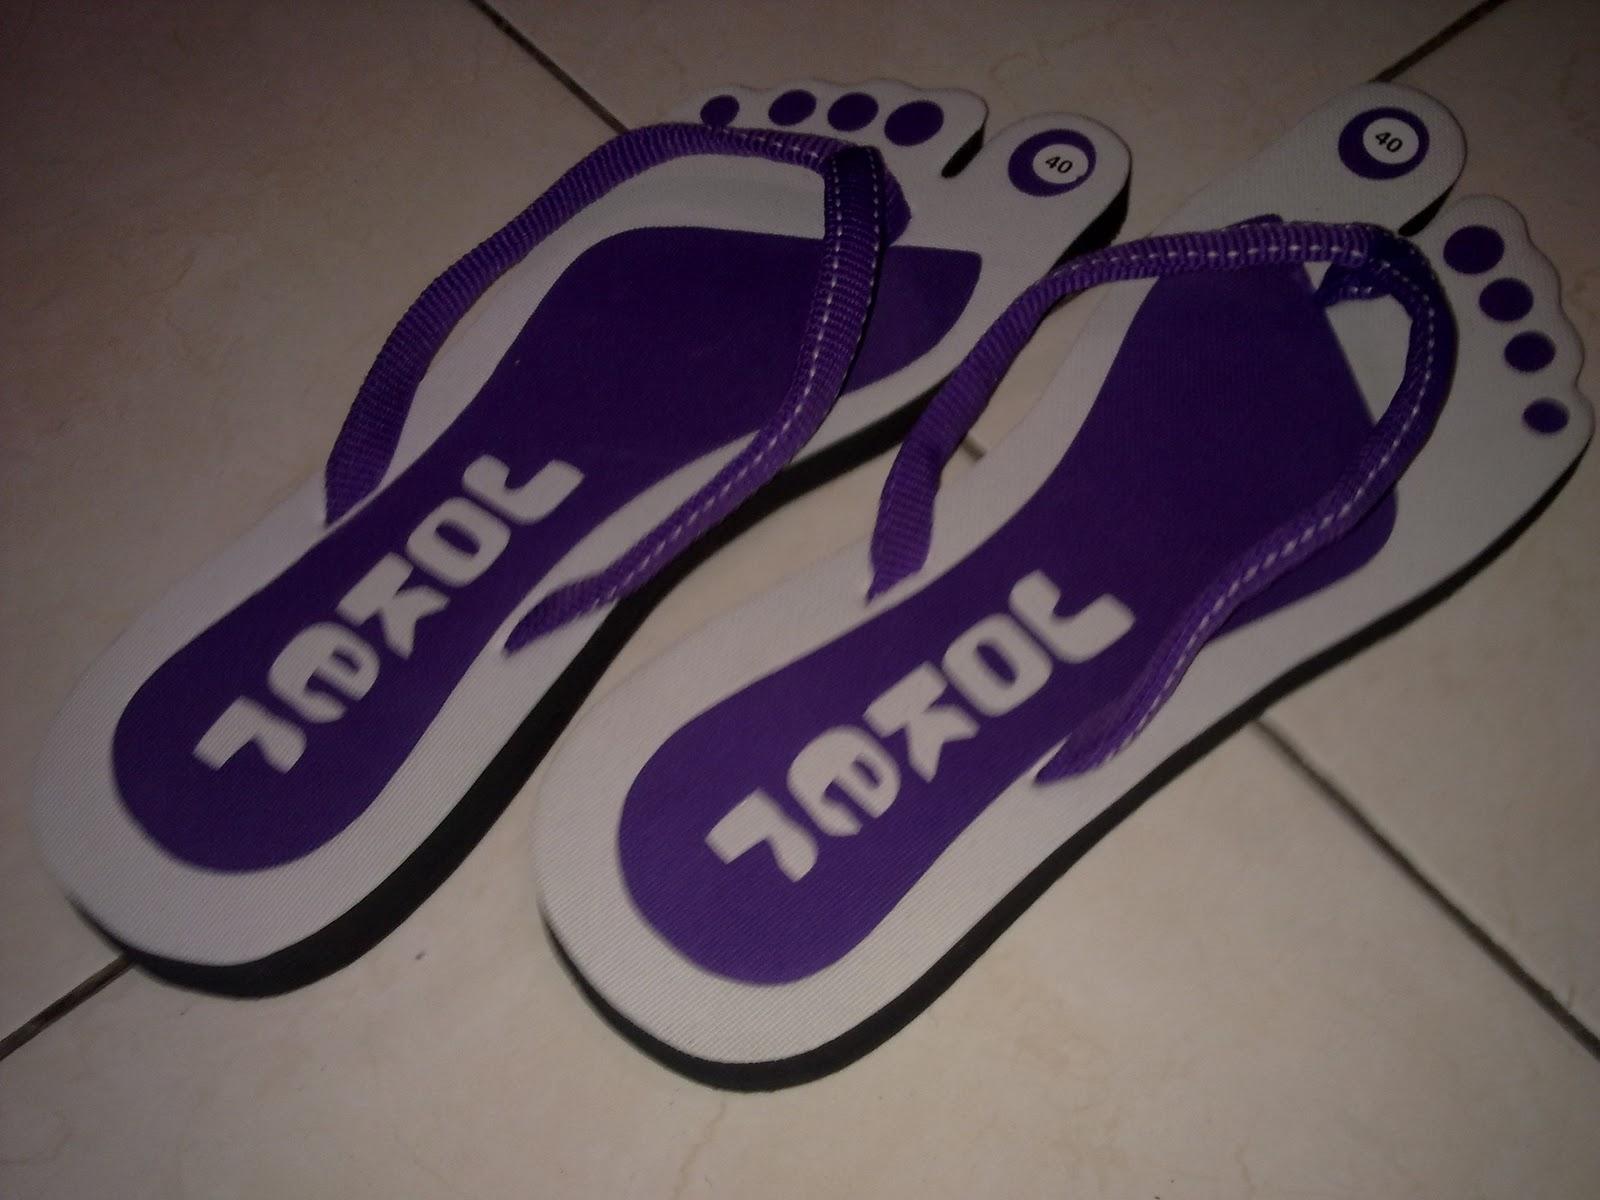 Koleksi Barang Unik Sandal Sandal Lucu